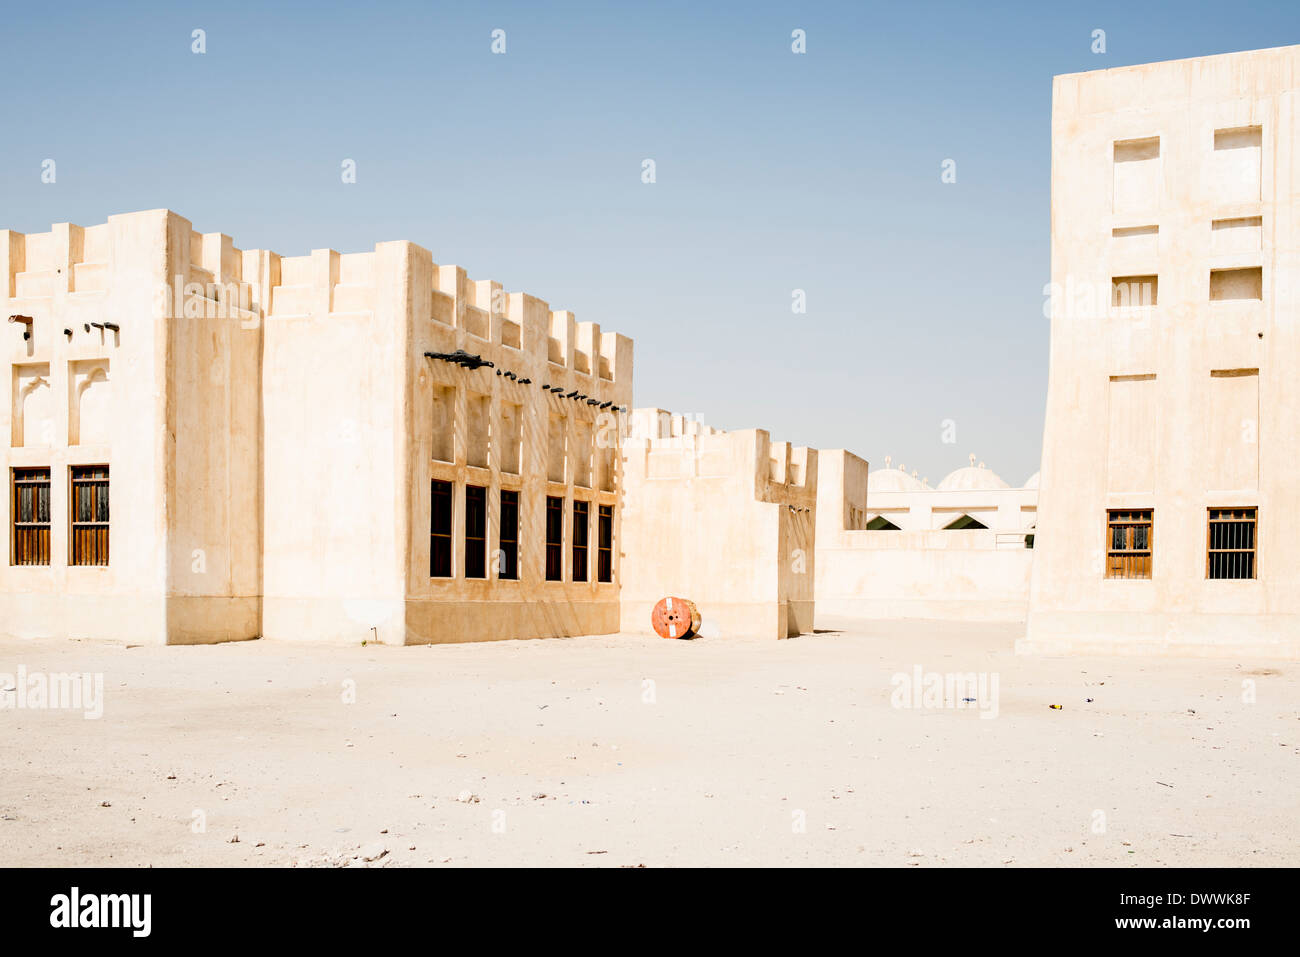 Mud-brick buildings, Doha Stock Photo